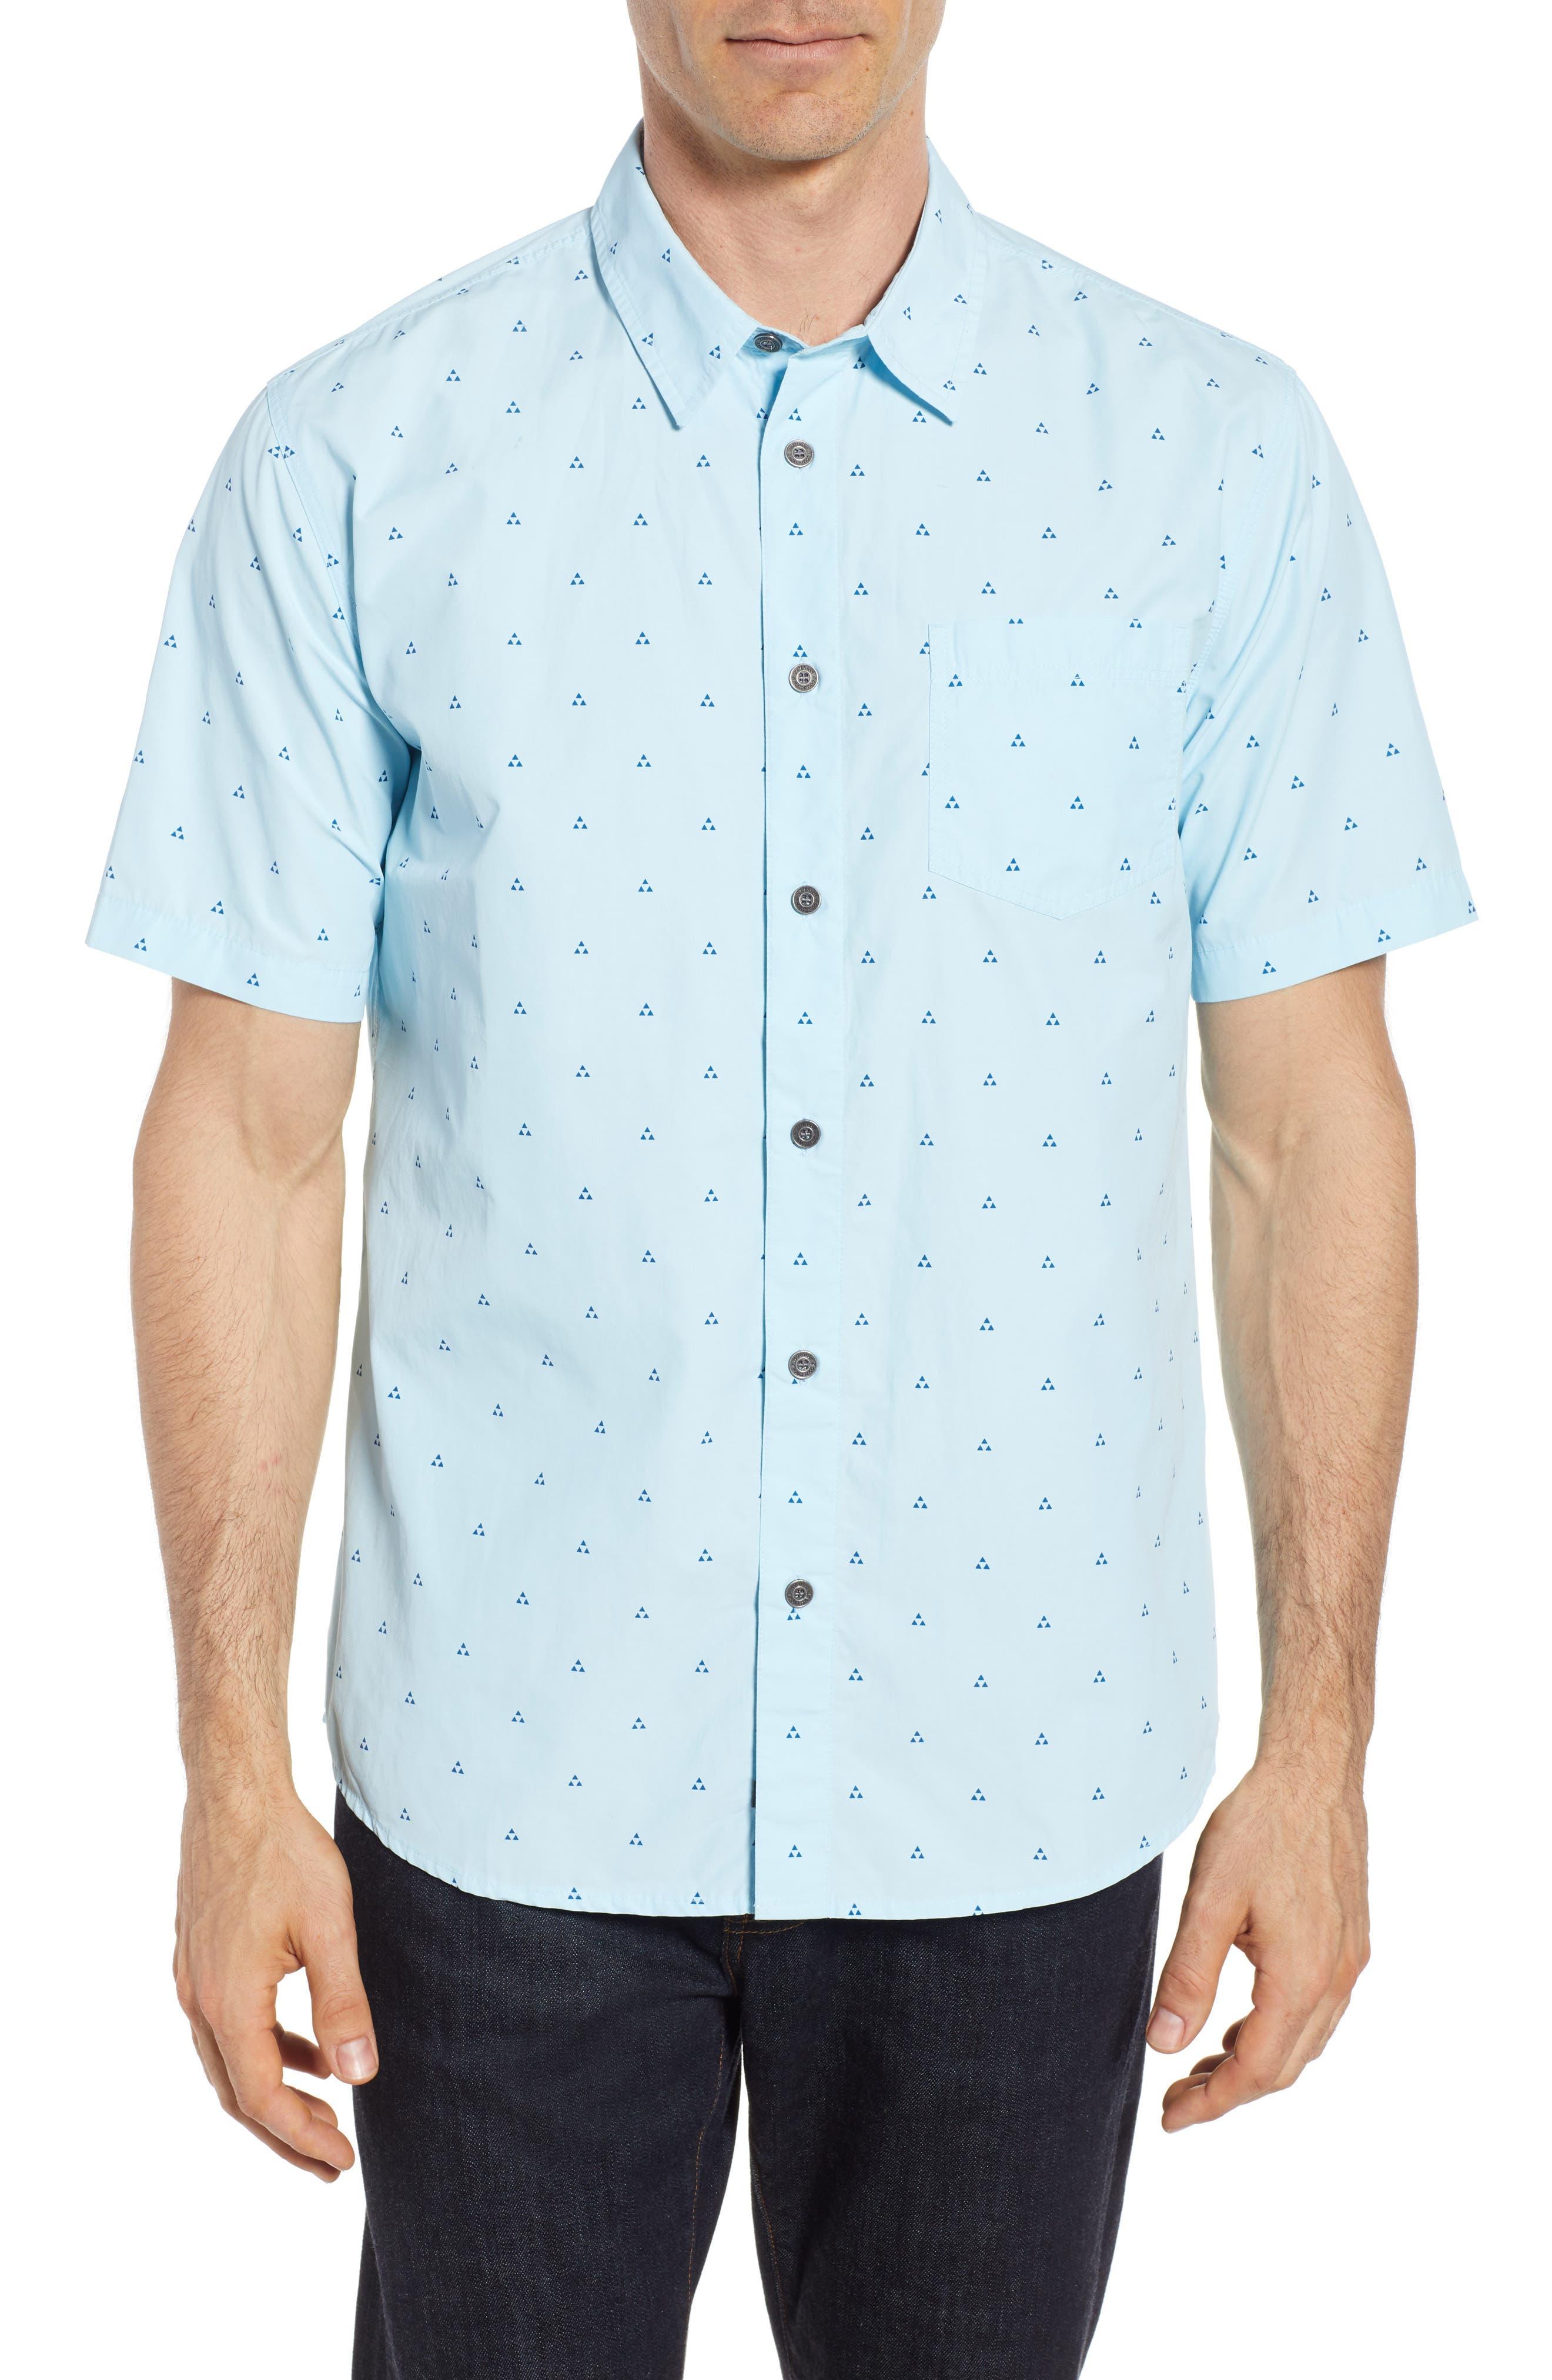 Trailblazed Regular Fit Performance Sport Shirt,                             Main thumbnail 1, color,                             CRYSTAL BLUE